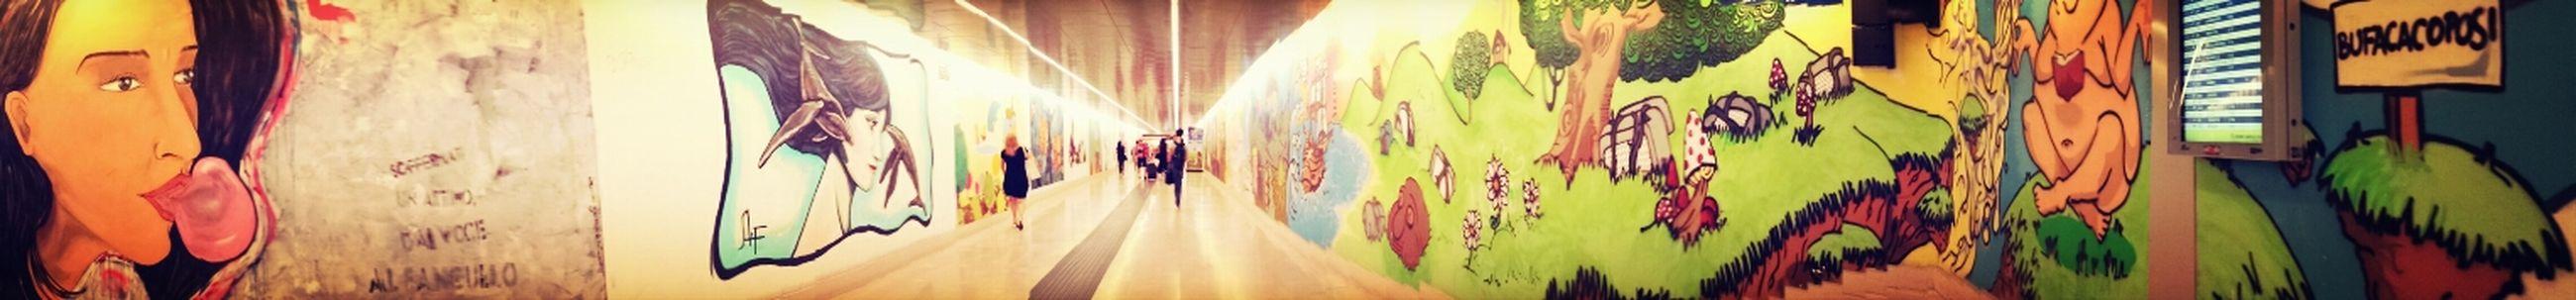 Pensieri cattivi che volano via....Subway Public Transportation Tunnel Street Art